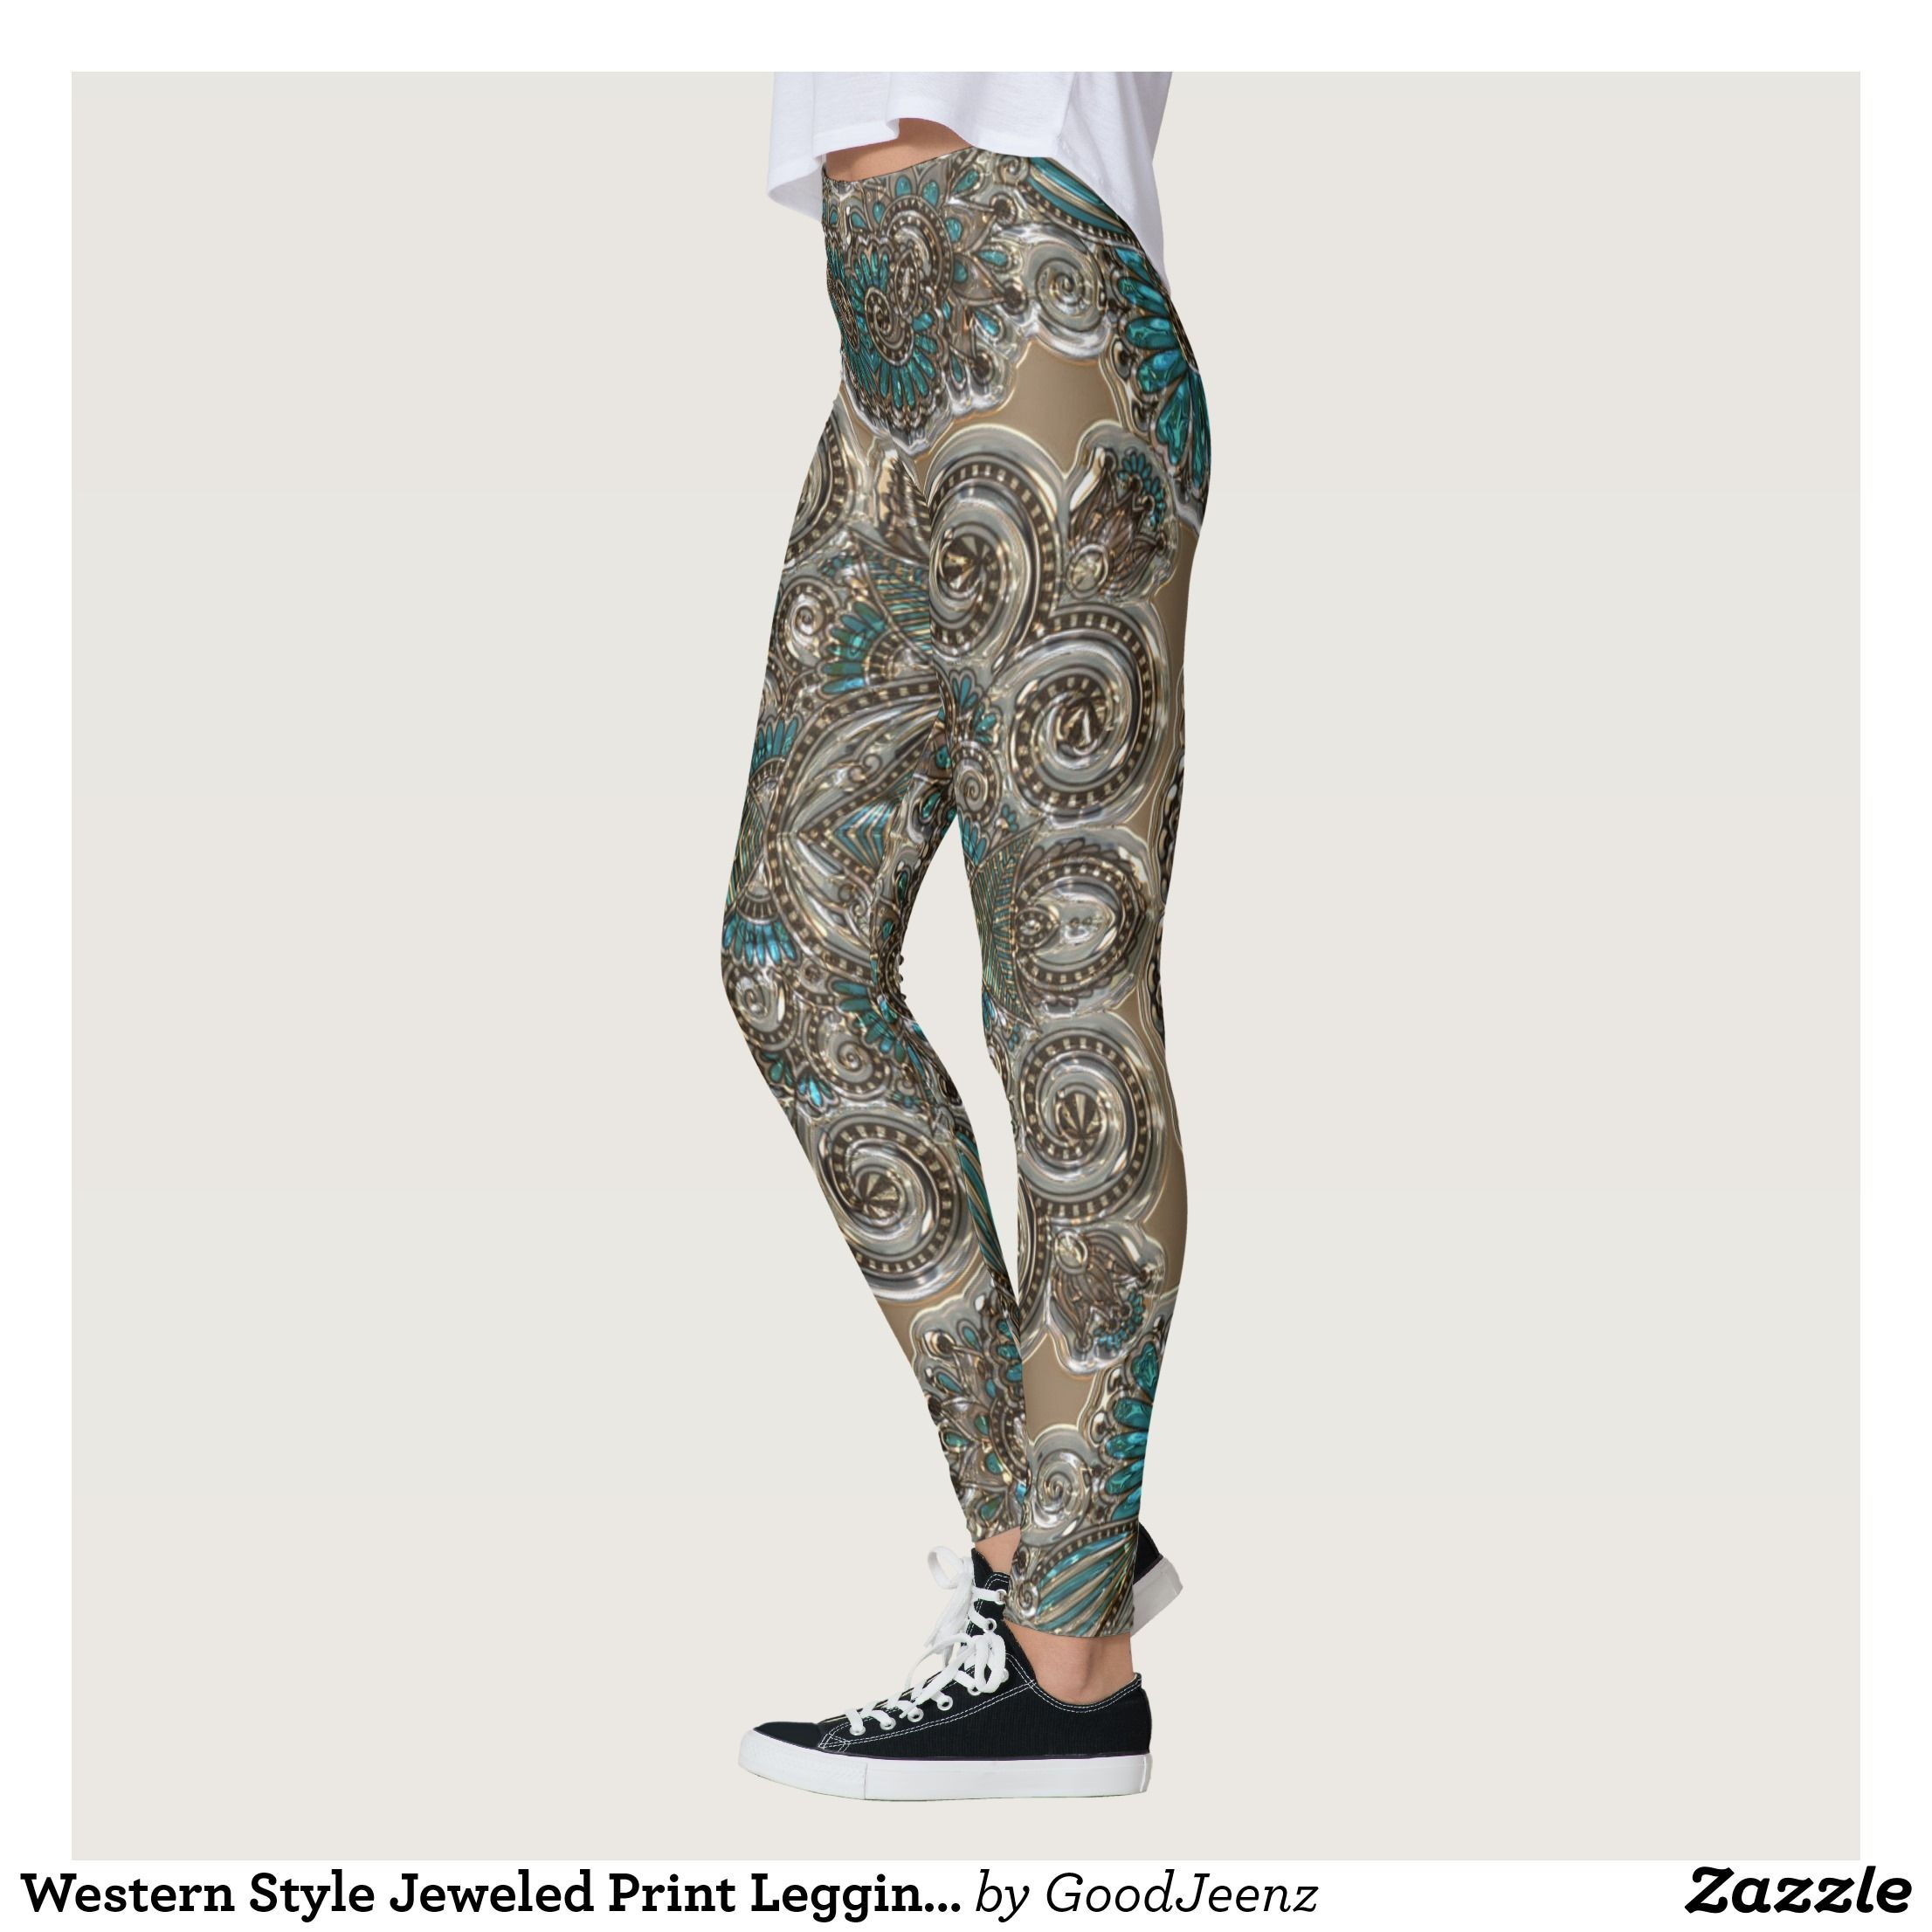 Western Style Jeweled Print Leggings